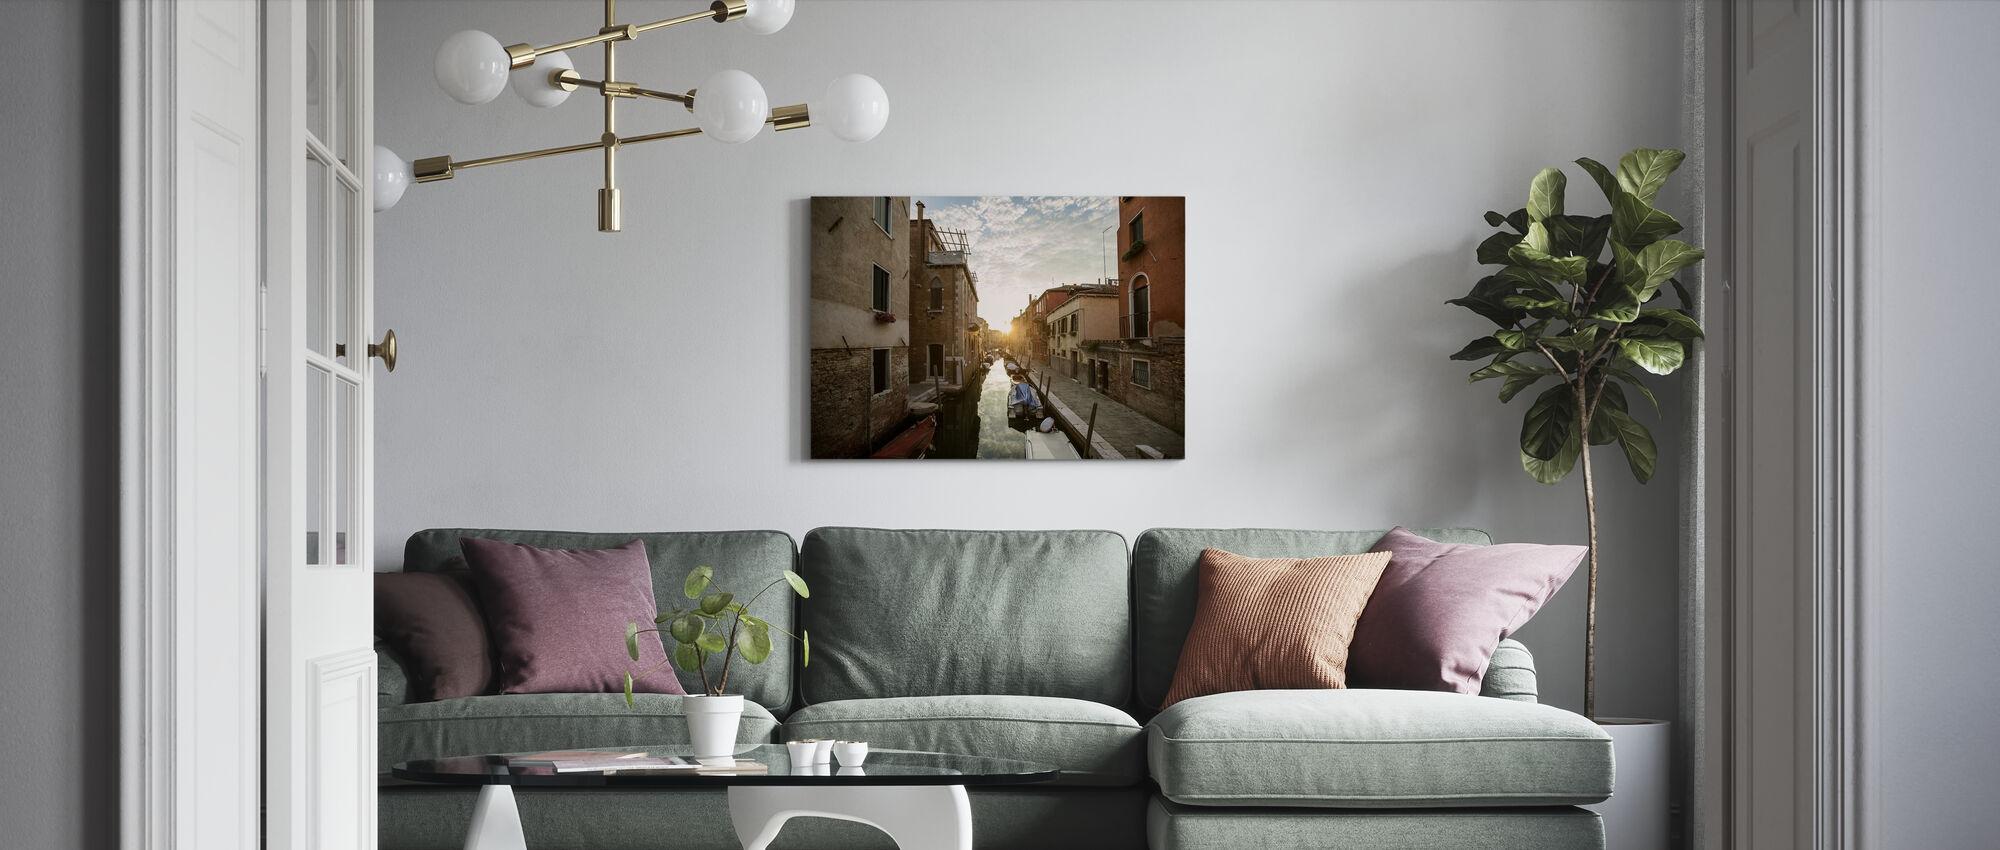 Gondola in Venice - Canvas print - Living Room